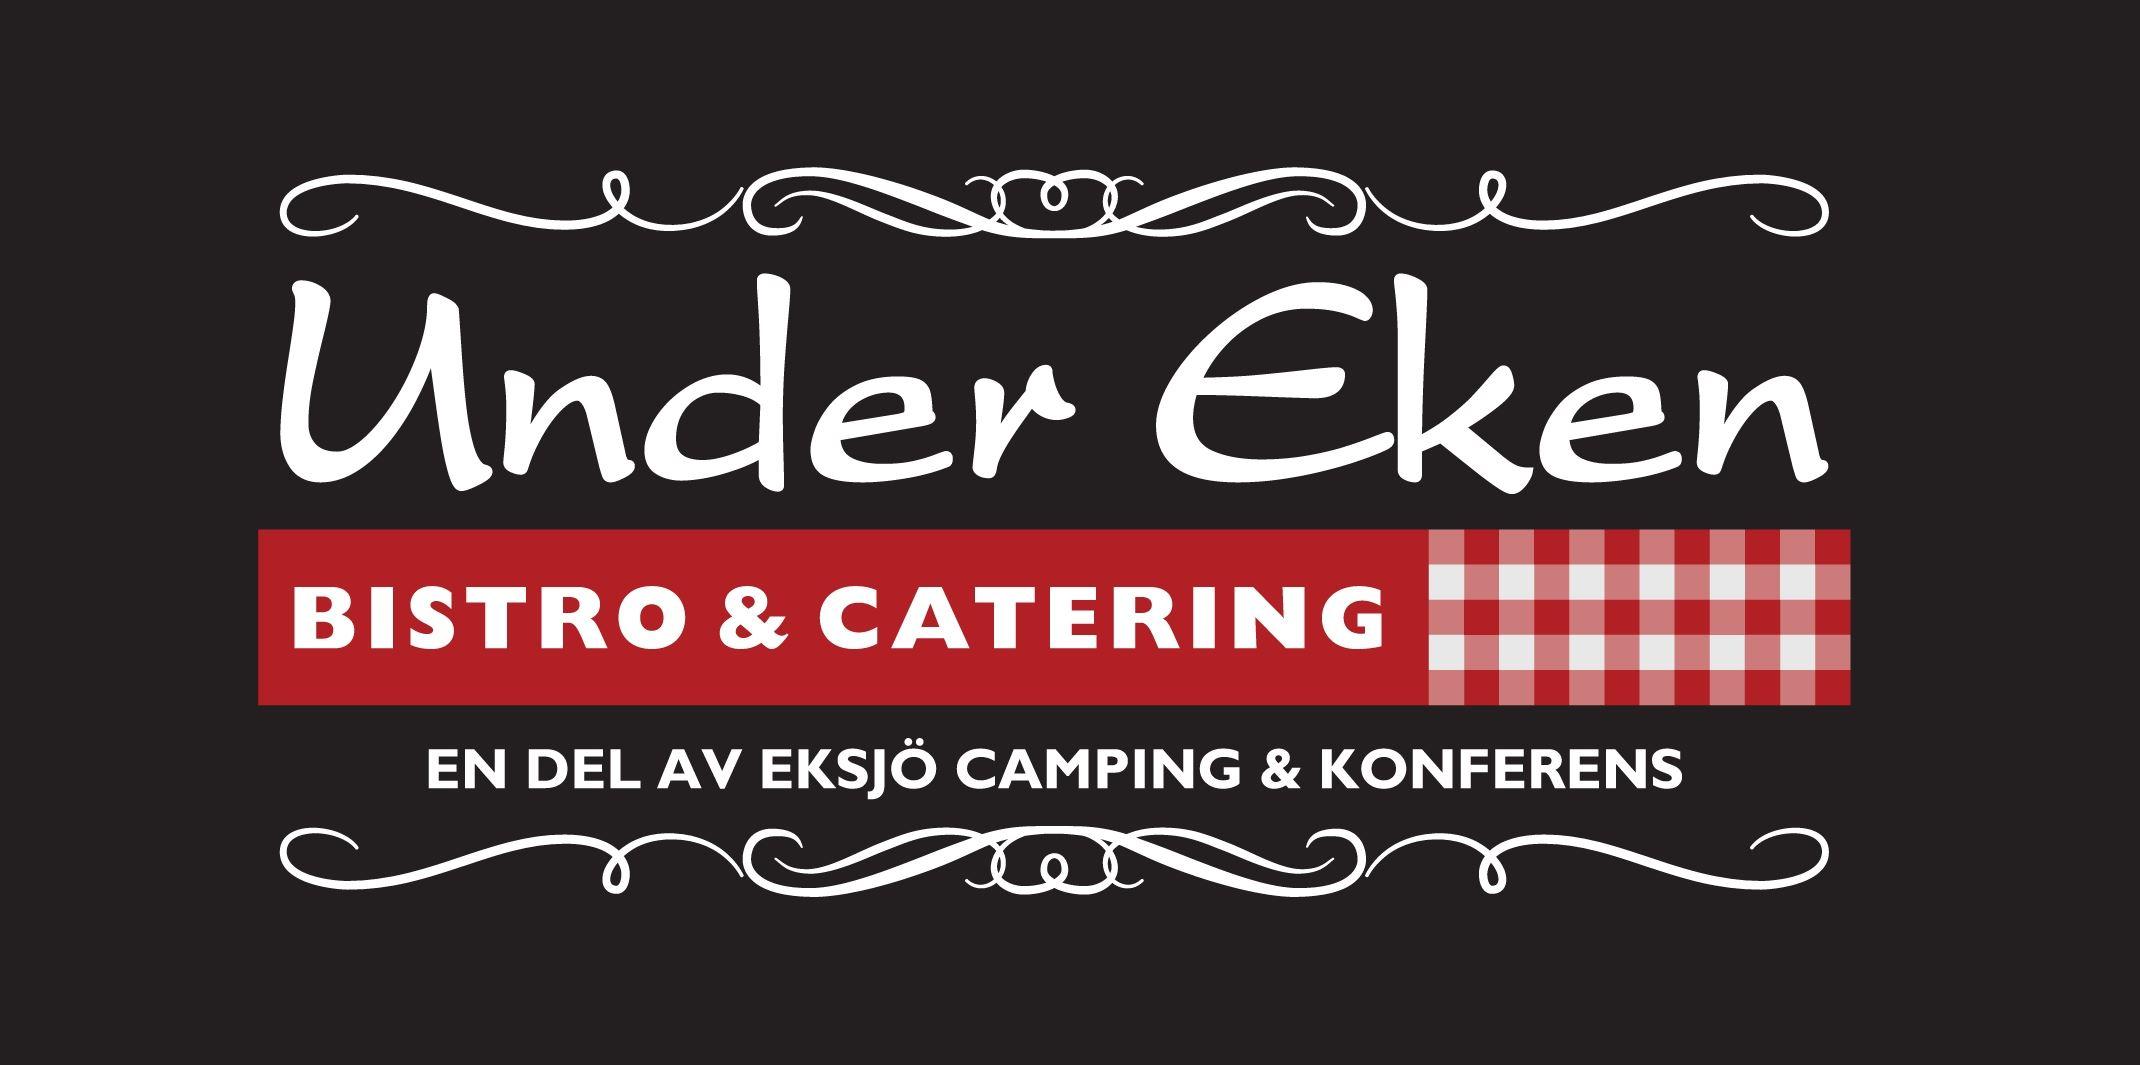 Under Eken Bistro och Catering